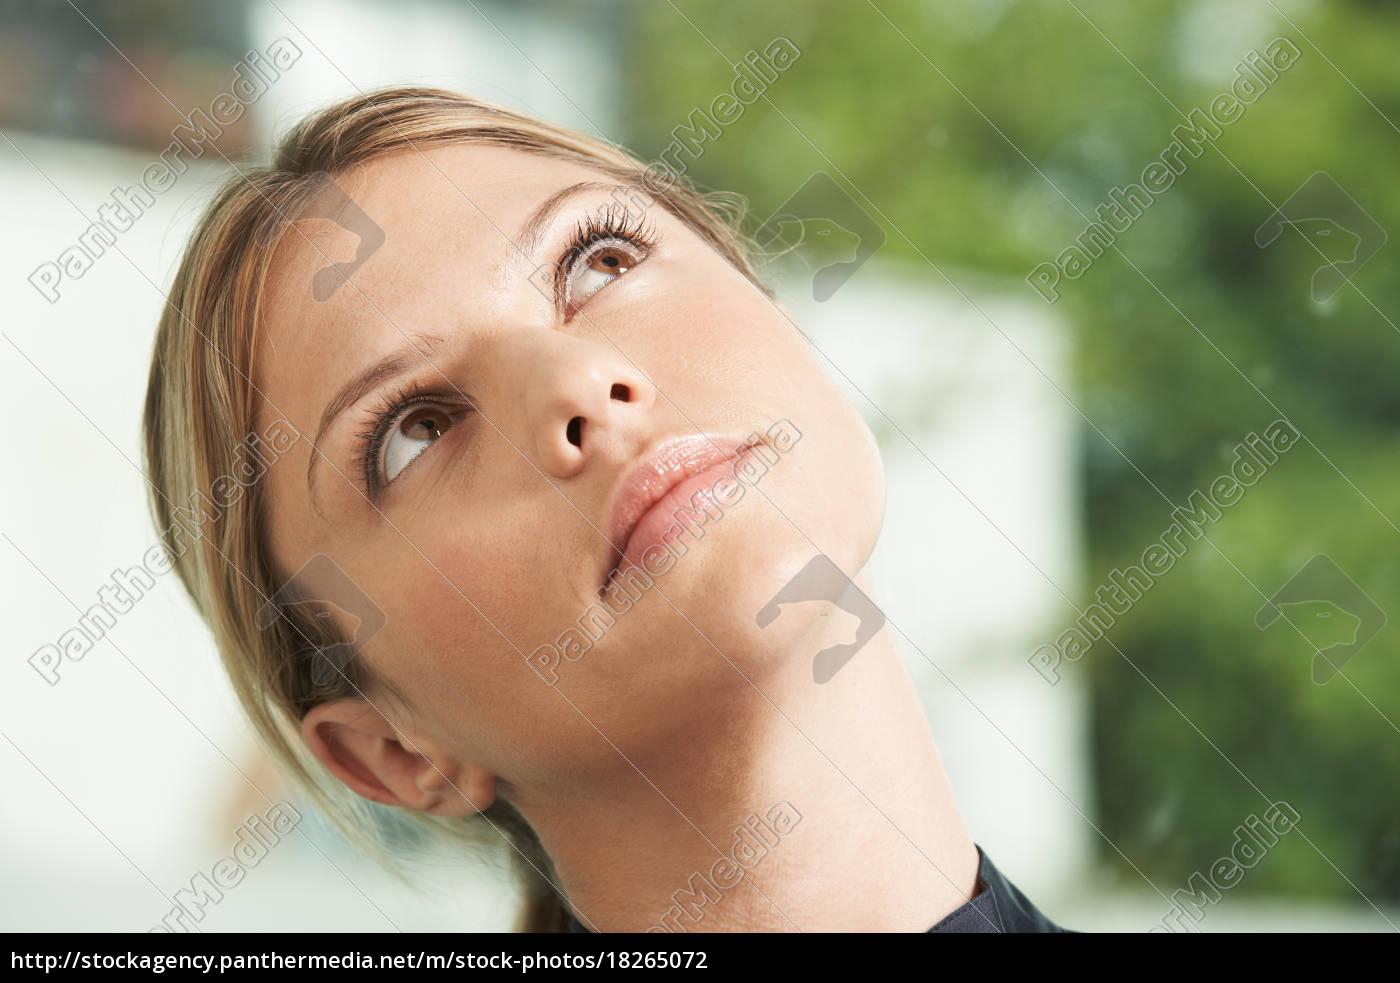 close-up-porträt, der, geschäftsfrau. - 18265072